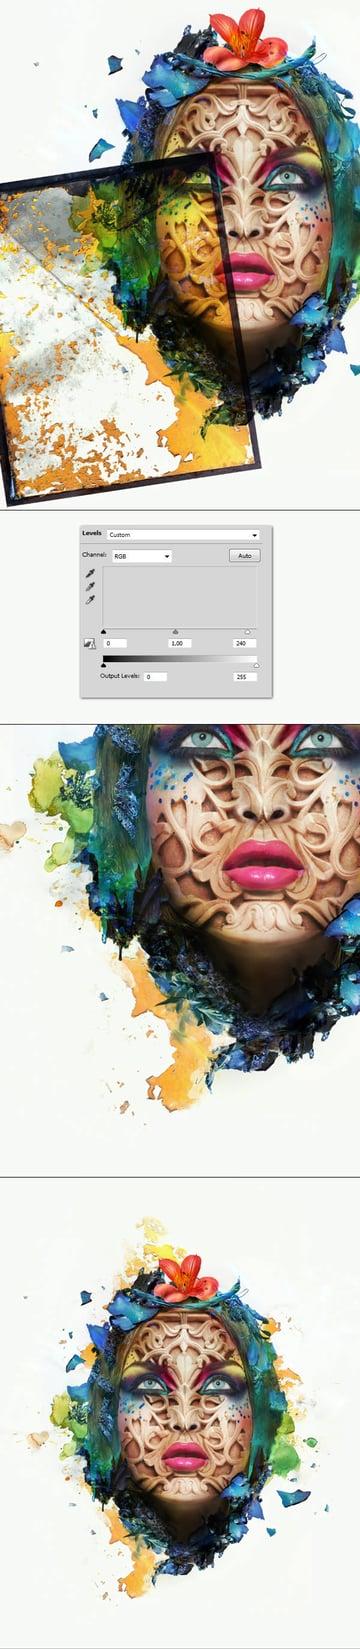 Add overlays around the portrait